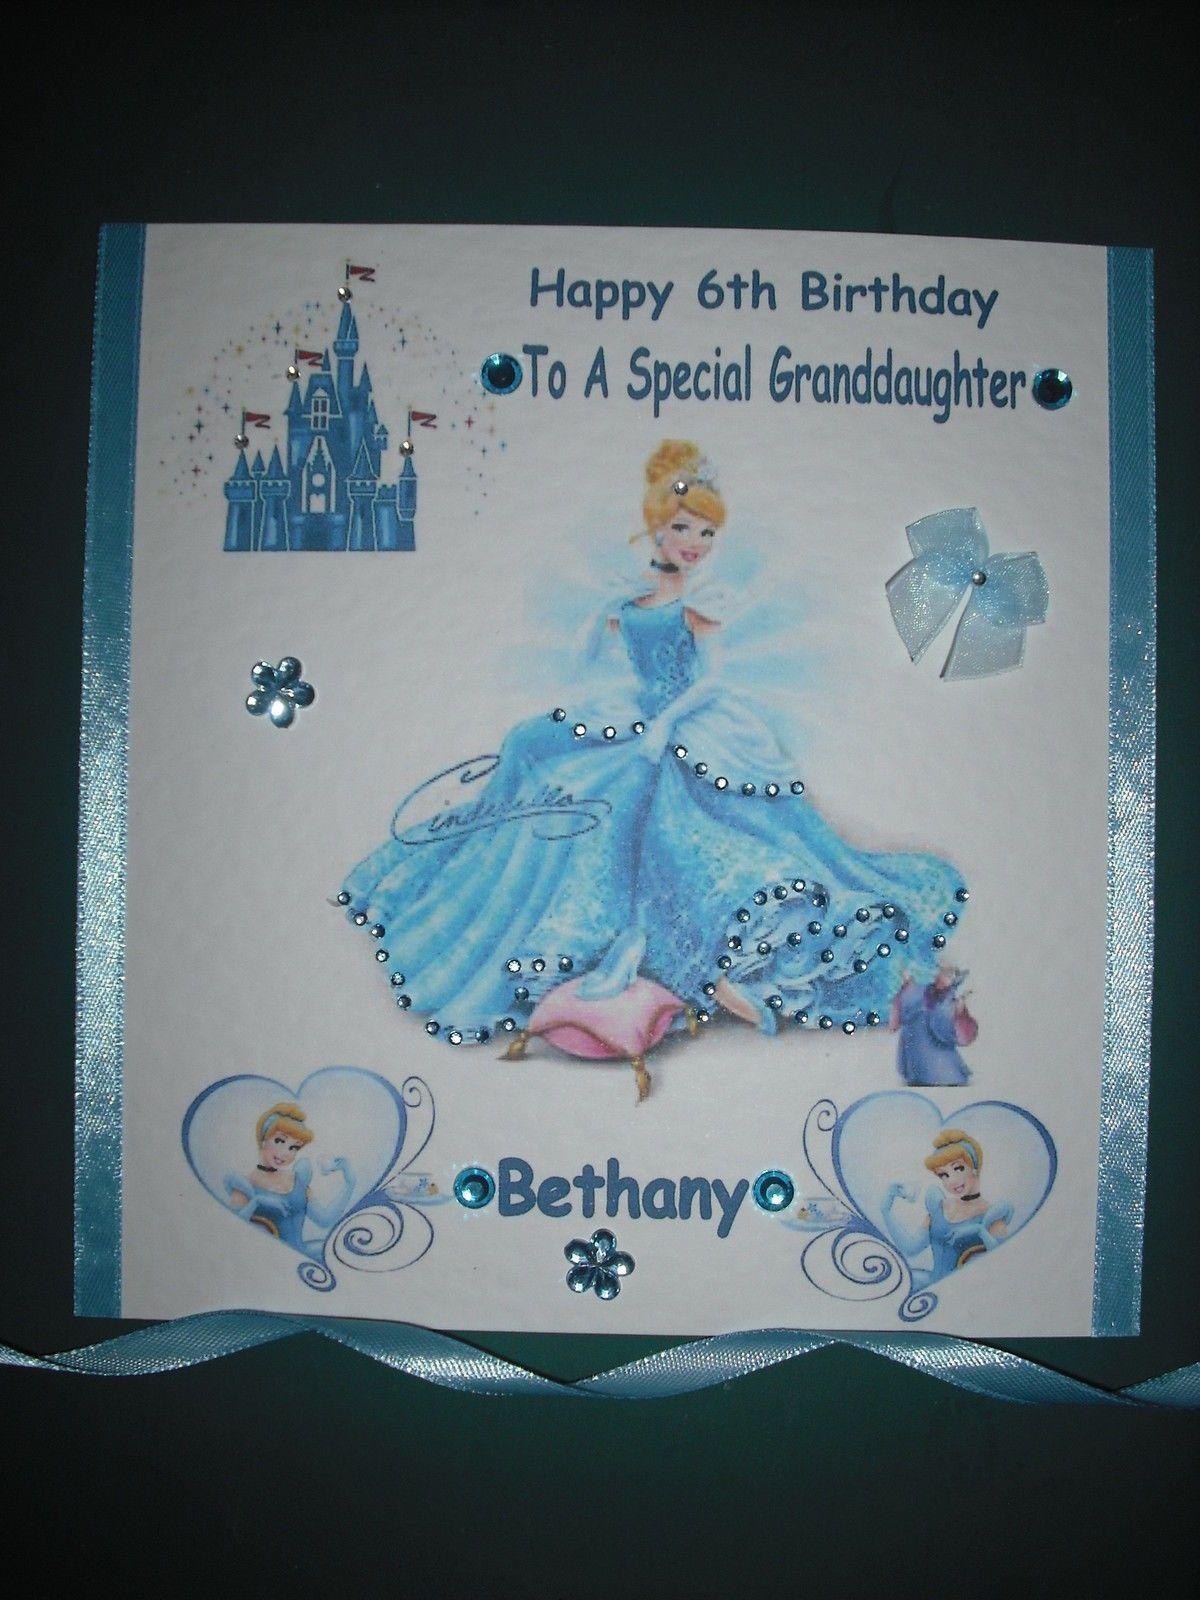 Handmade Personalised Cinderella Birthday Card Free 2nd Class Postage Birthday Cards Cinderella Birthday Personal Cards